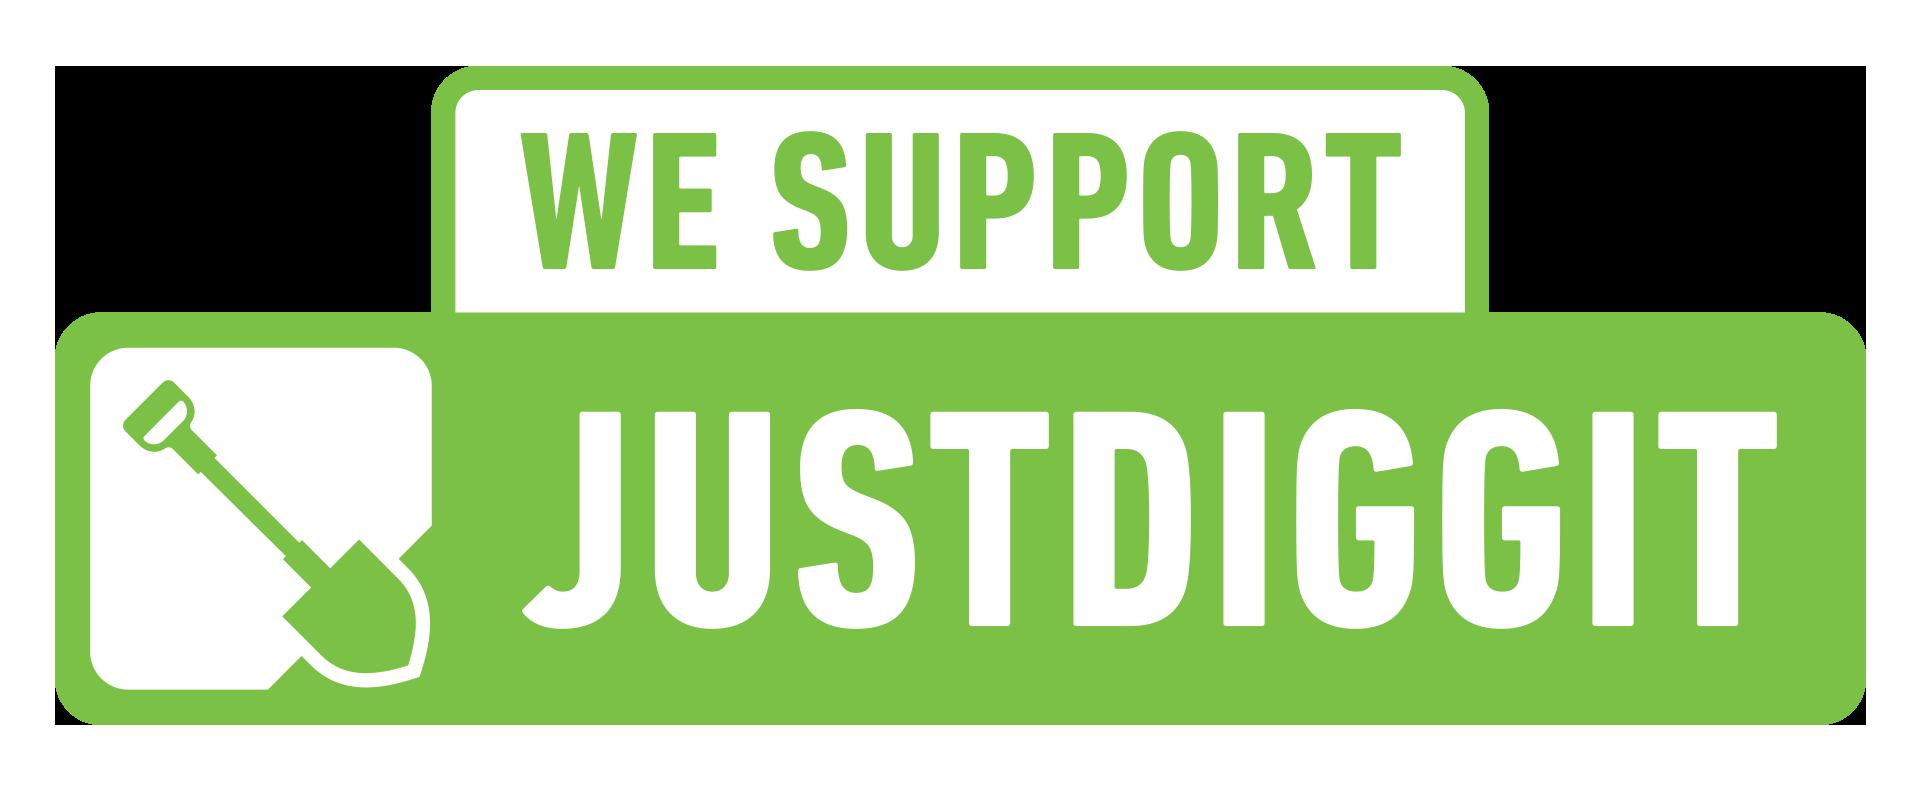 WE support JUSTDIGGIT